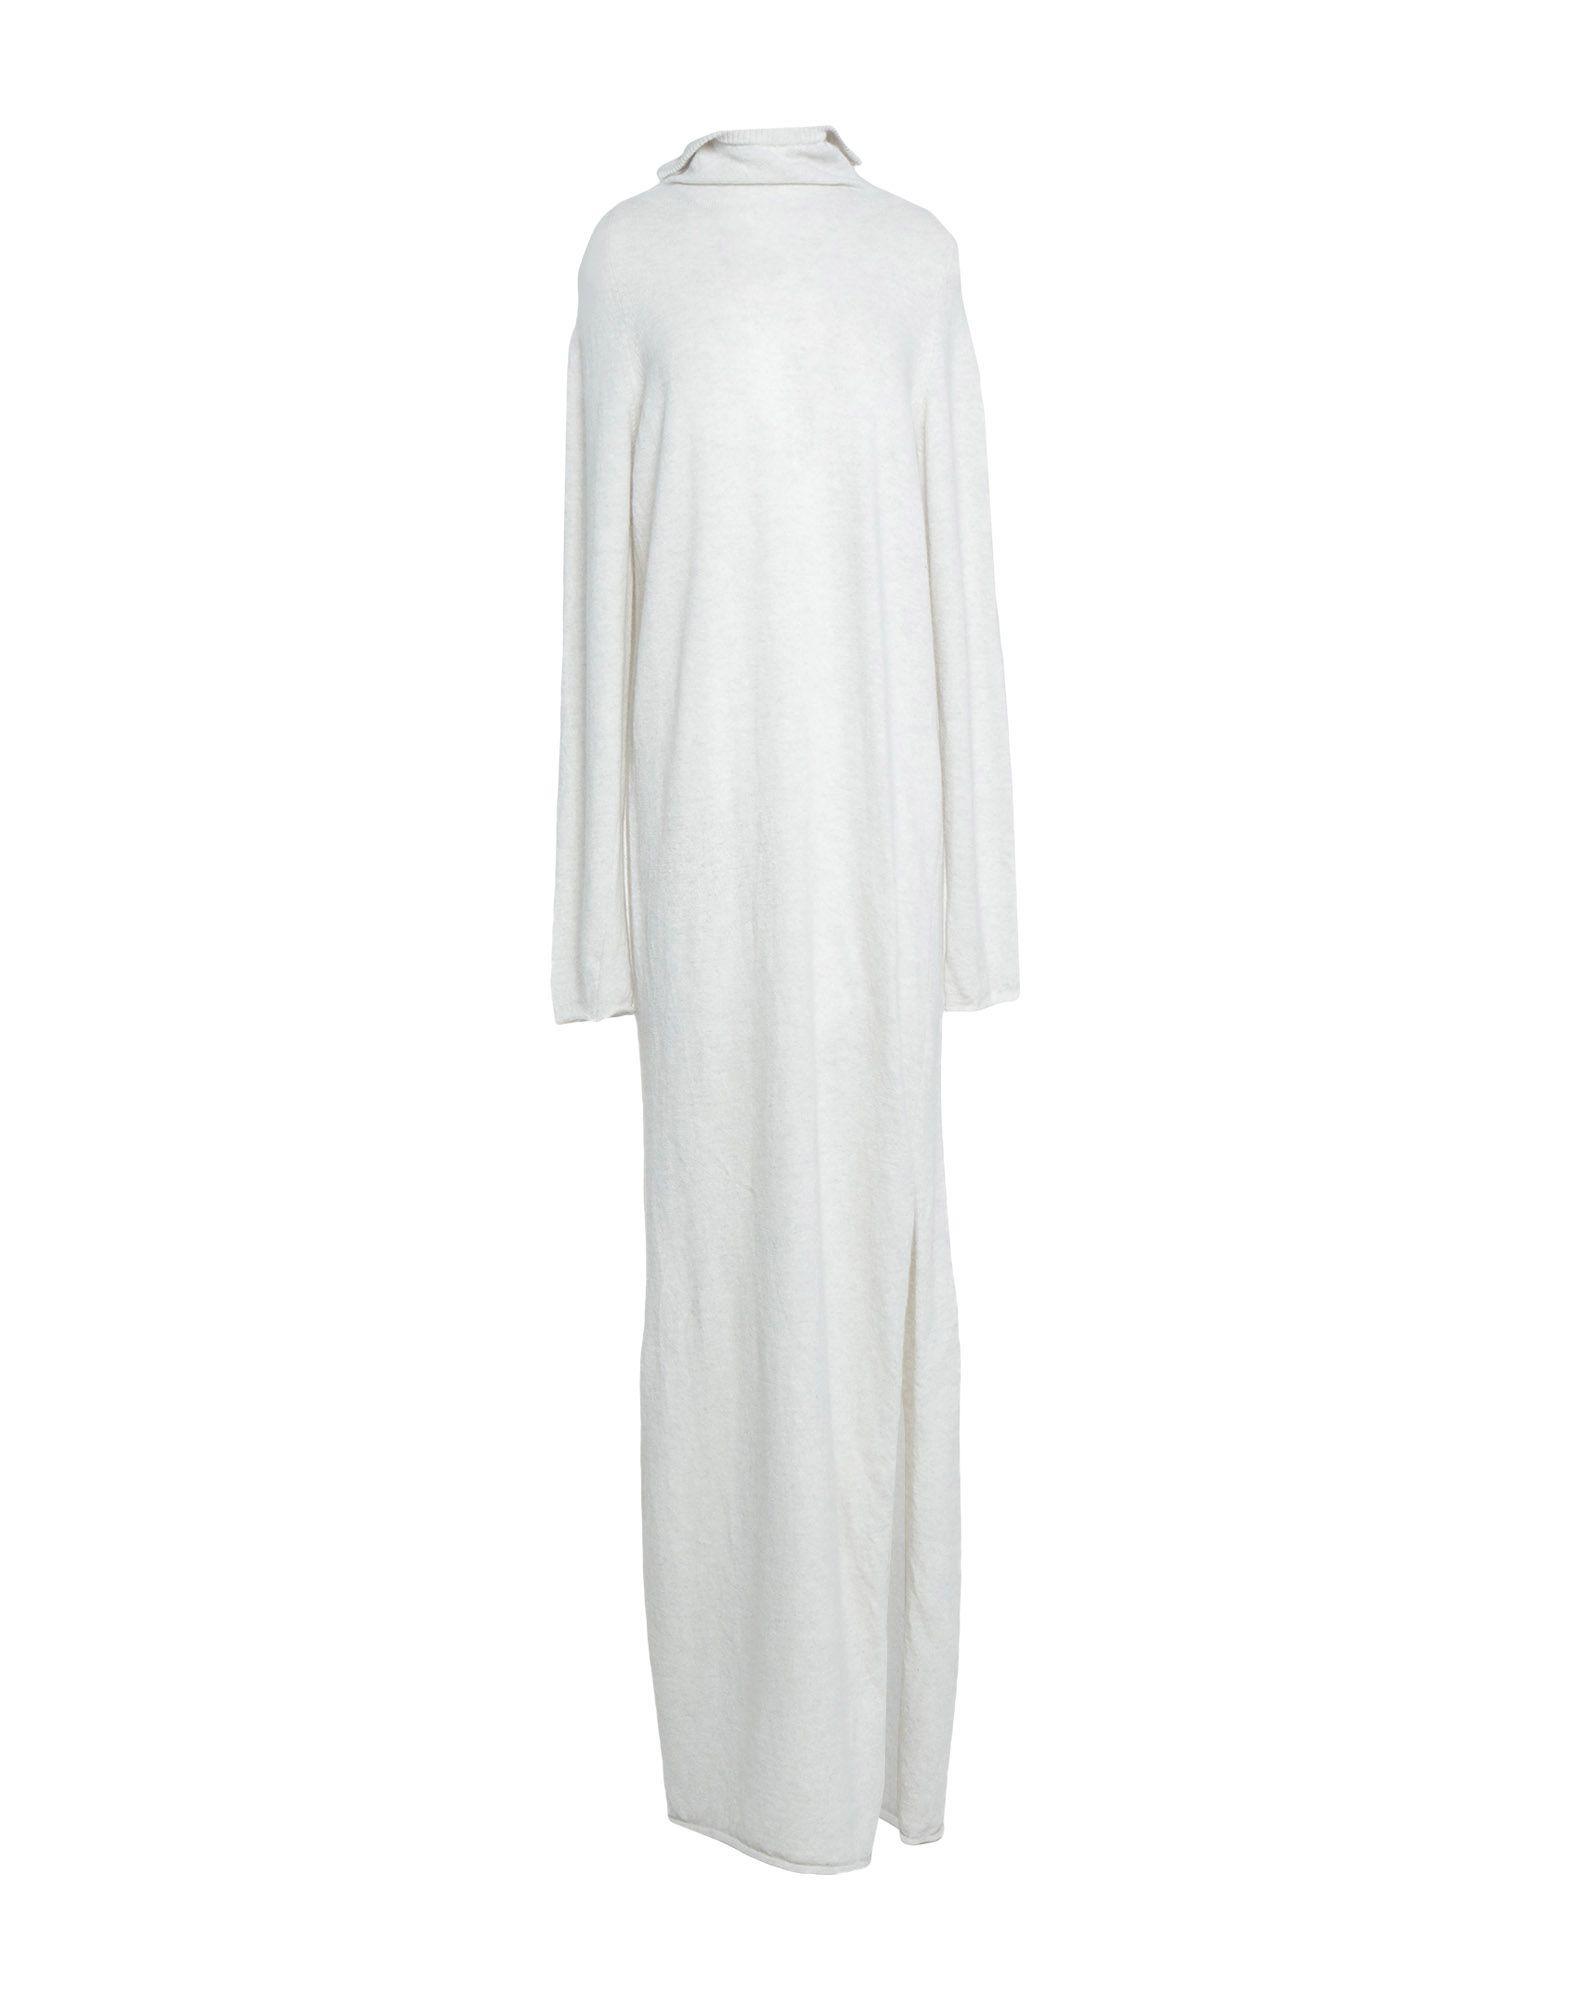 LOST & FOUND Длинное платье